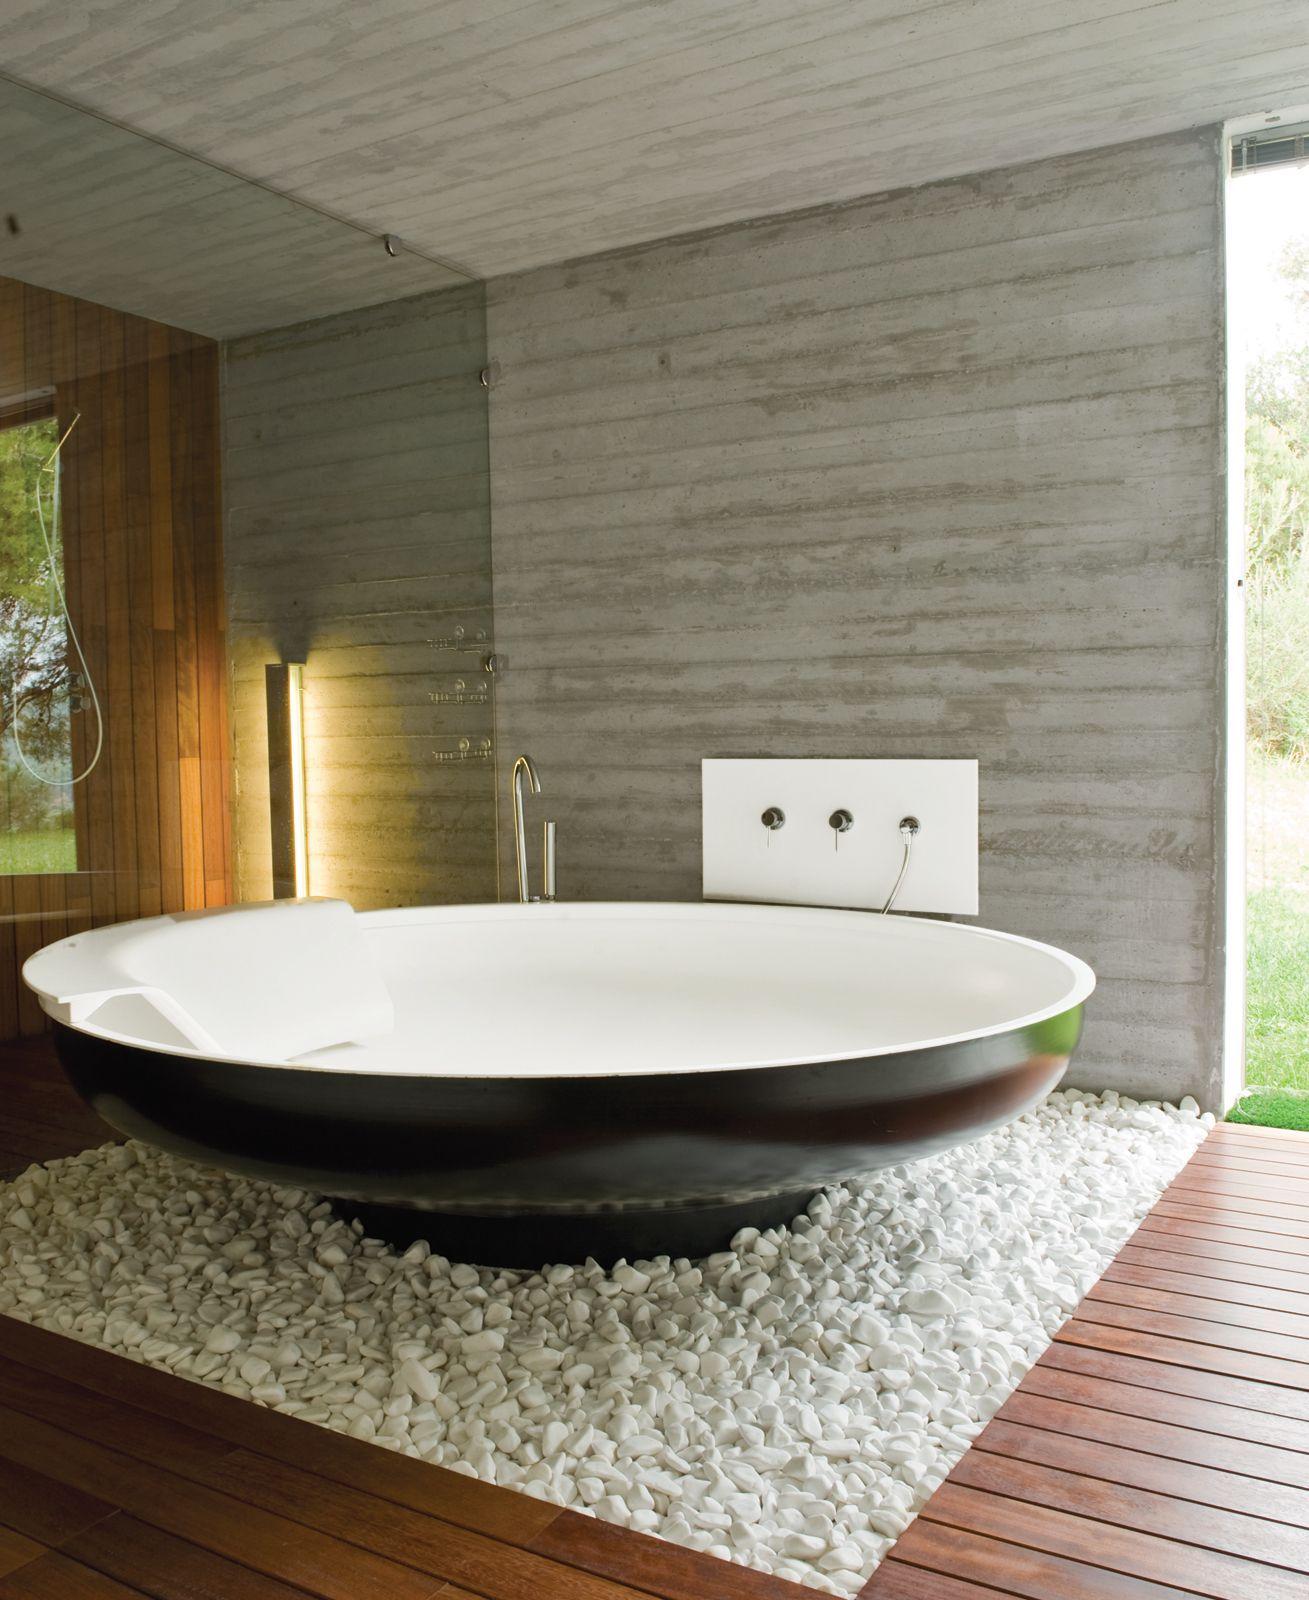 A UFO bathtub by Benedini Associati for Agape lends an alien touch